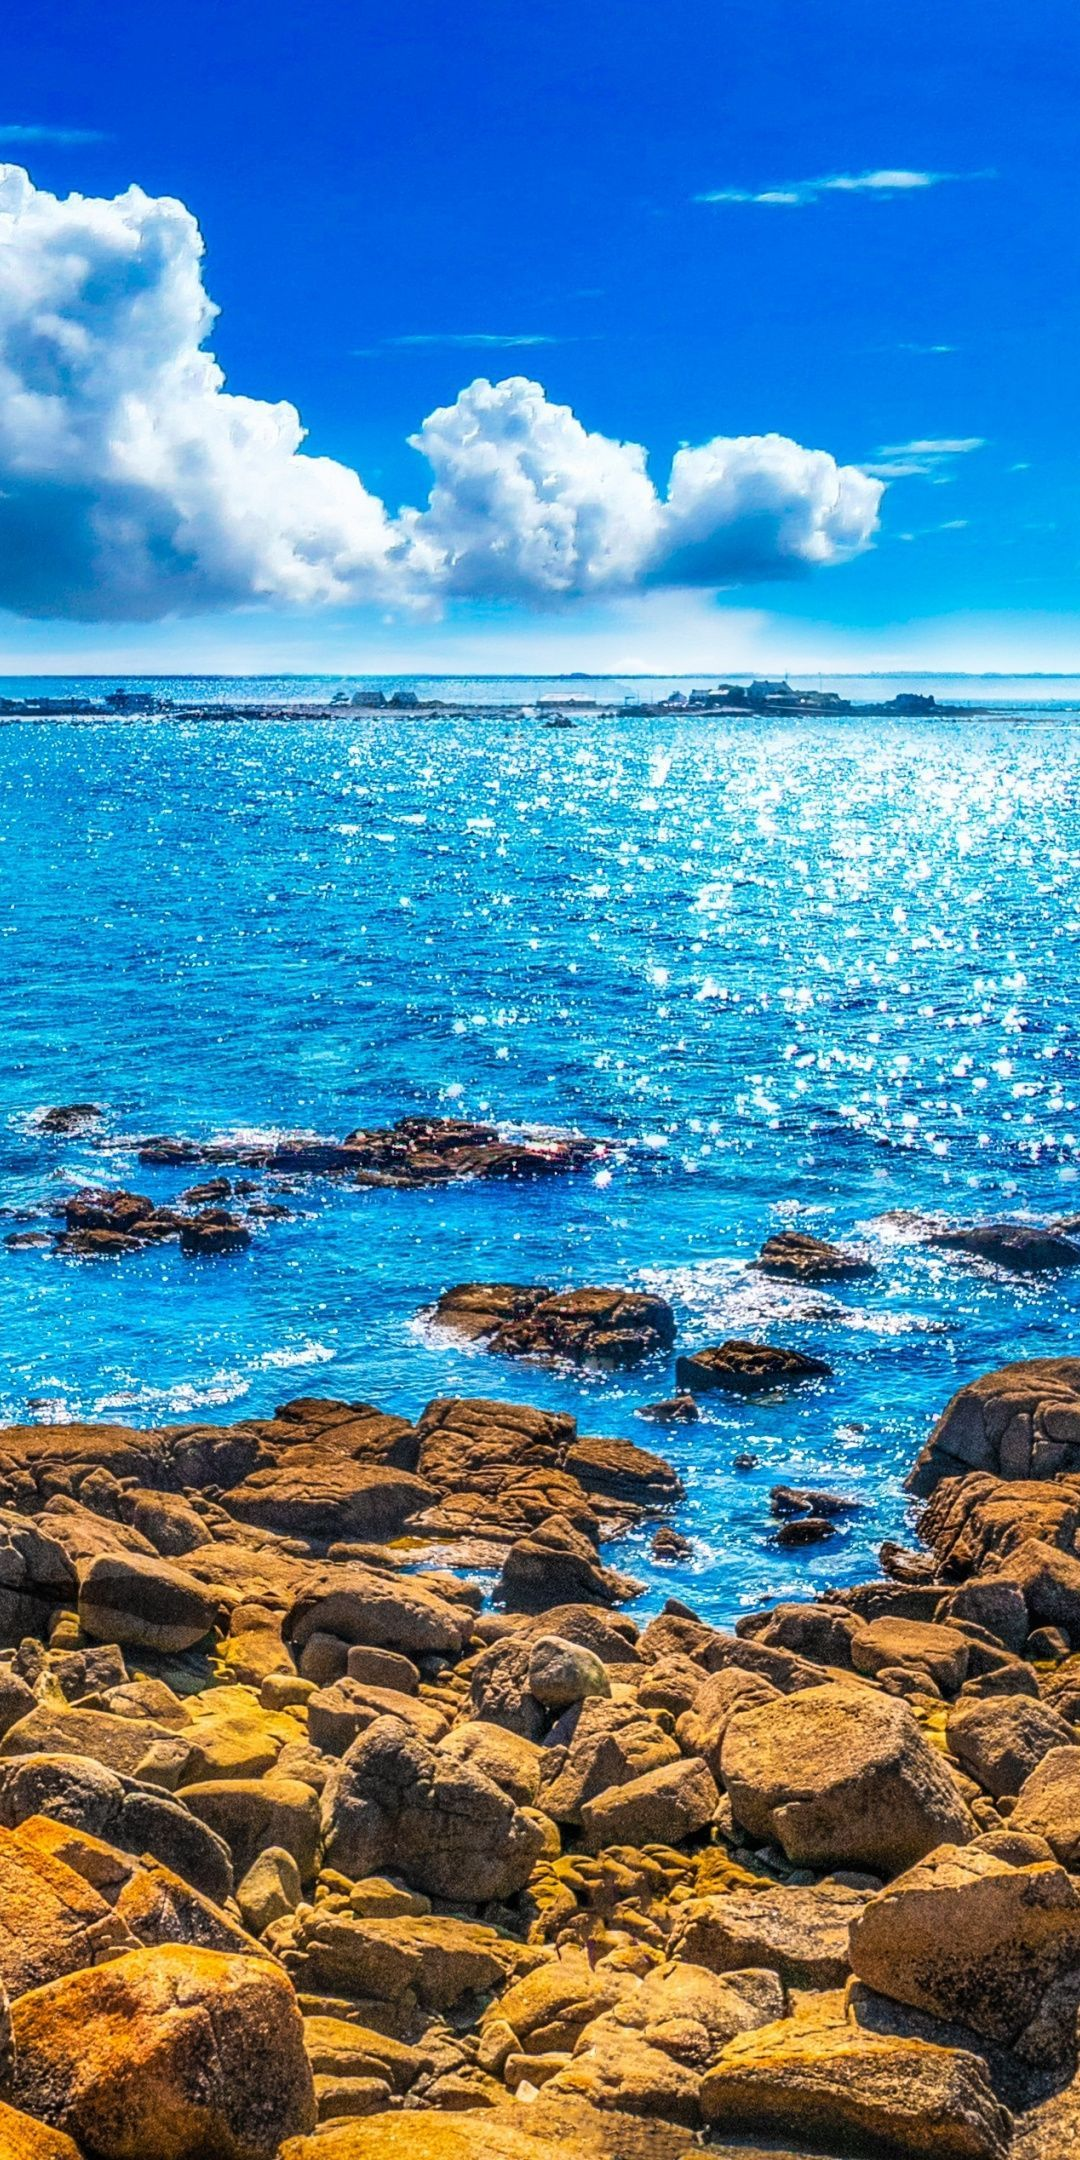 Rocks Coast Sunny Day Blue Sea 1080x2160 Wallpaper 4k